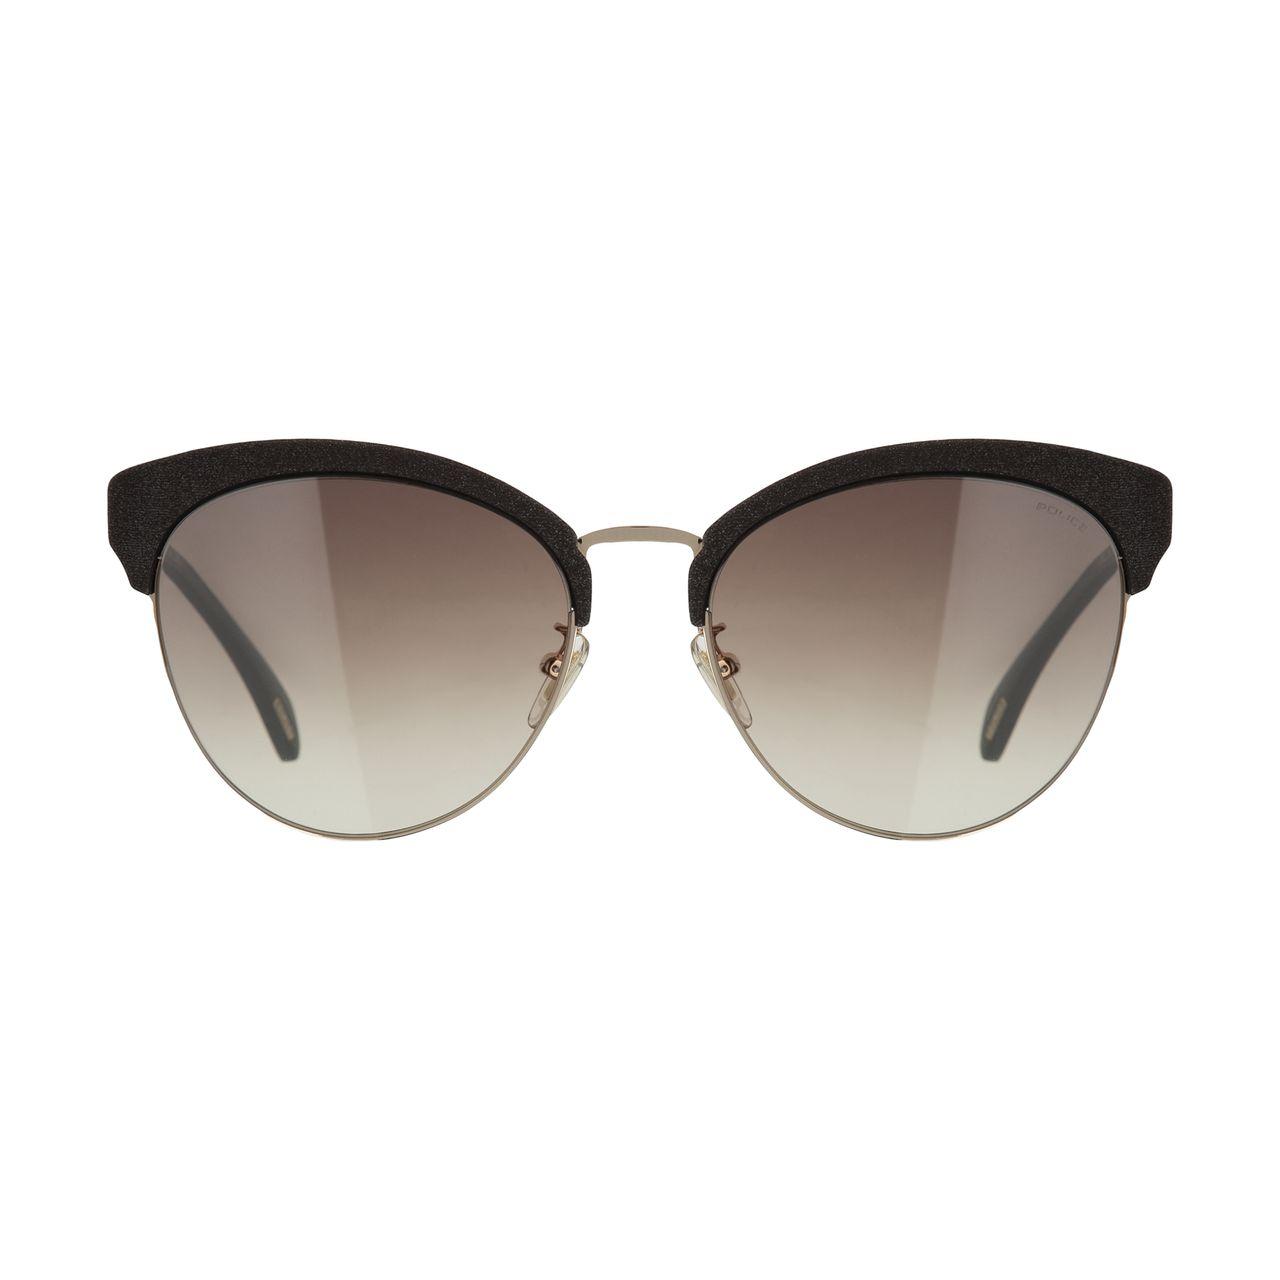 عینک آفتابی زنانه پلیس مدل SPL619 0A39